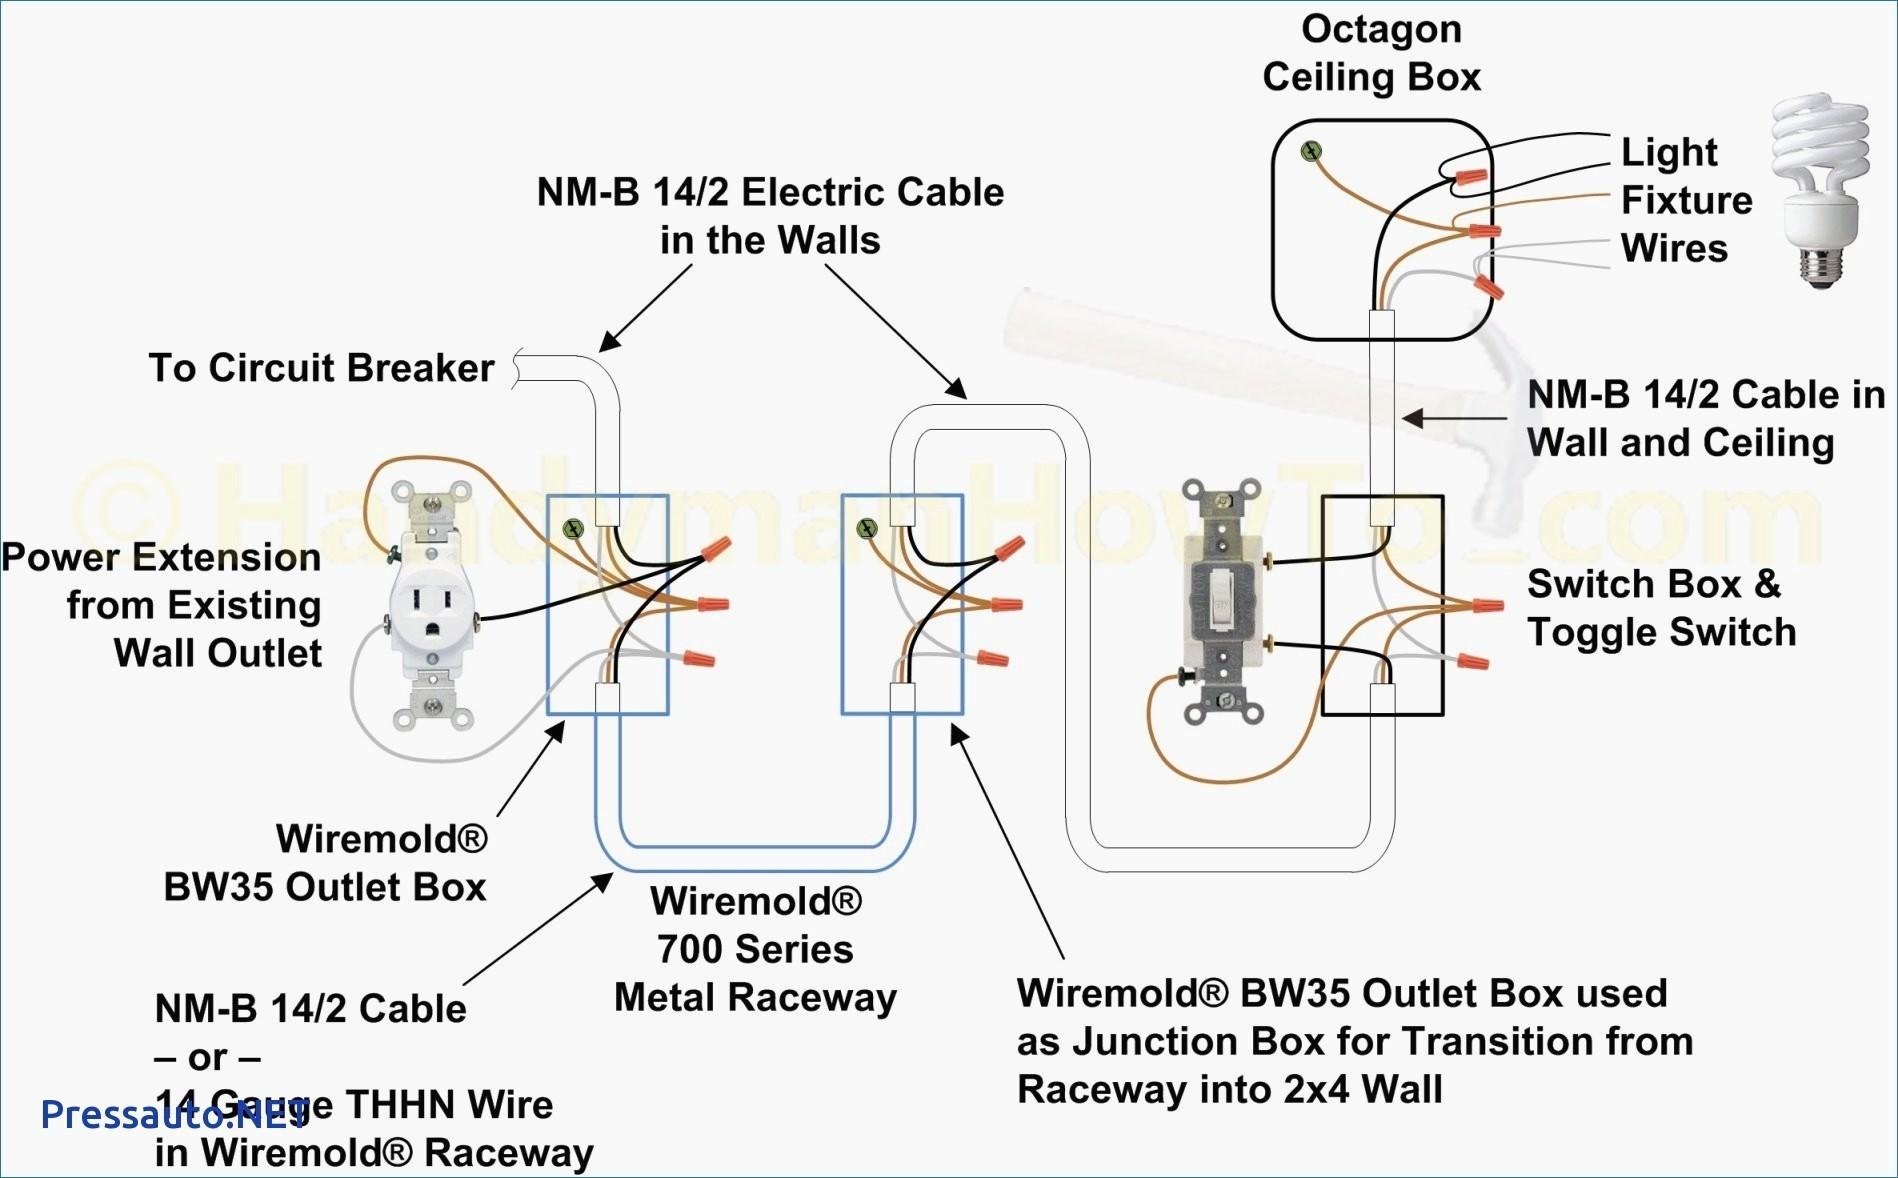 leviton single pole dimmer switch wiring diagram 350 engine belt light